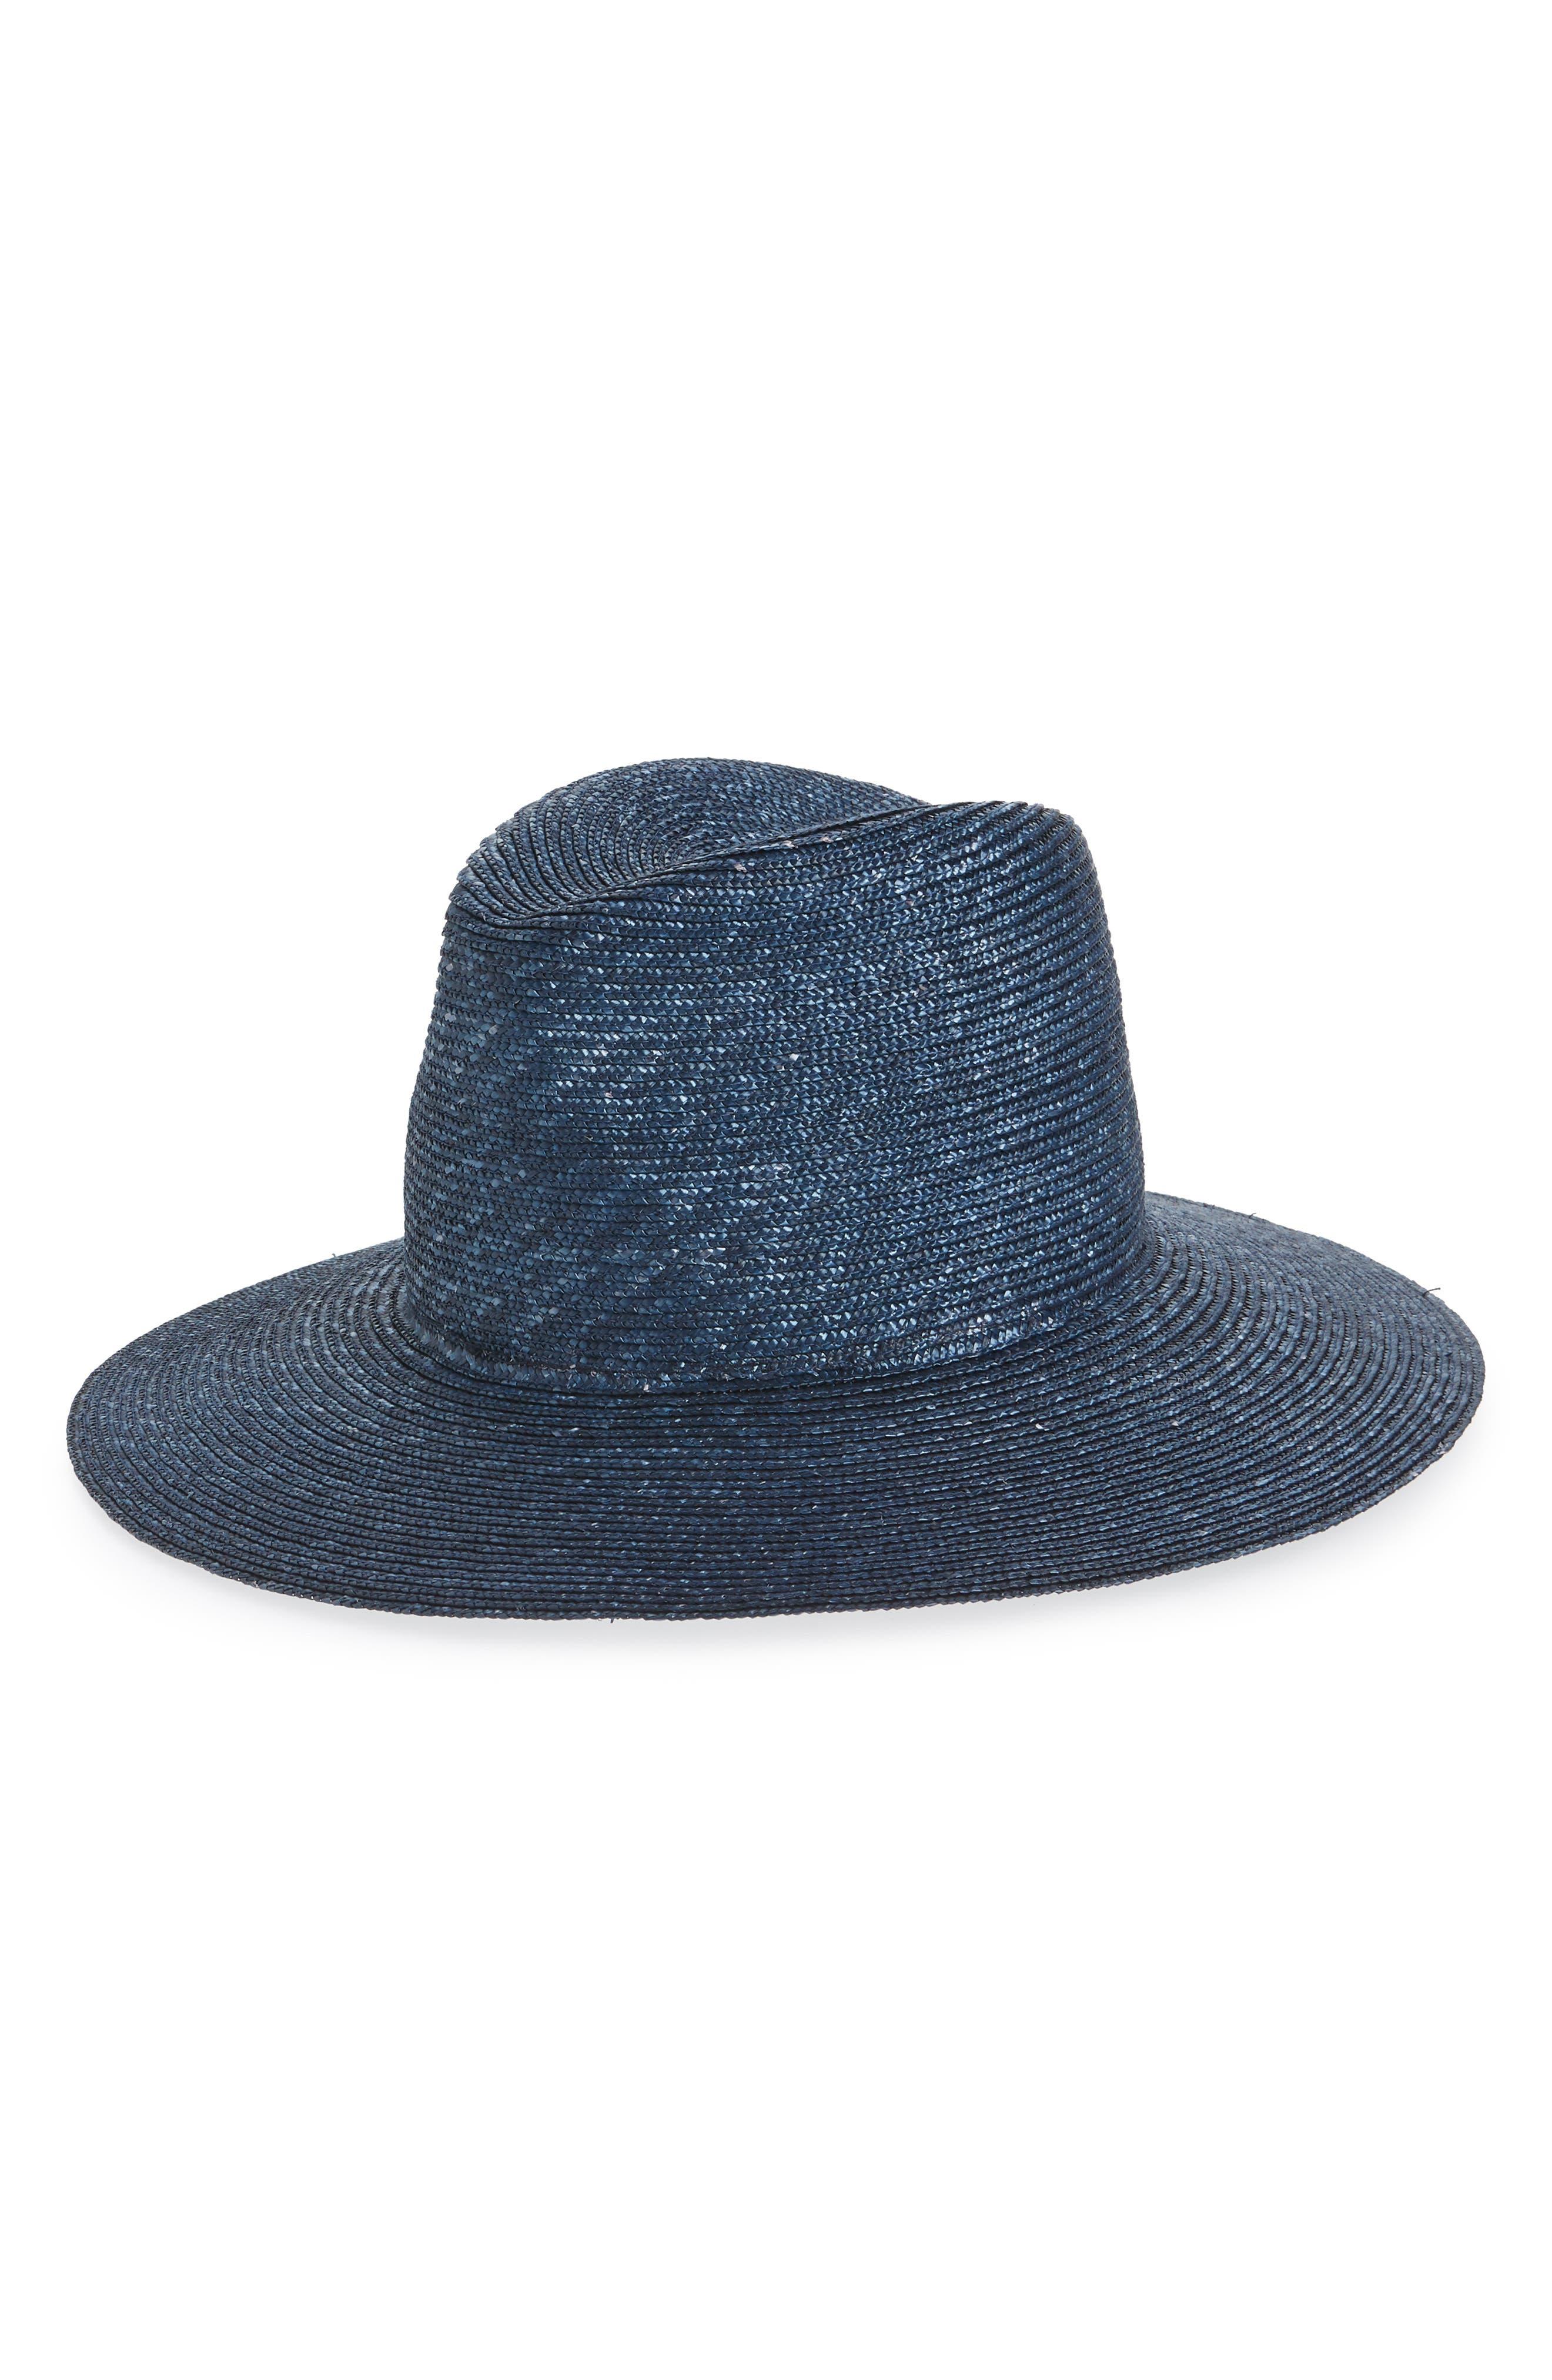 Plain Main Straw Hat,                             Main thumbnail 1, color,                             BLUE